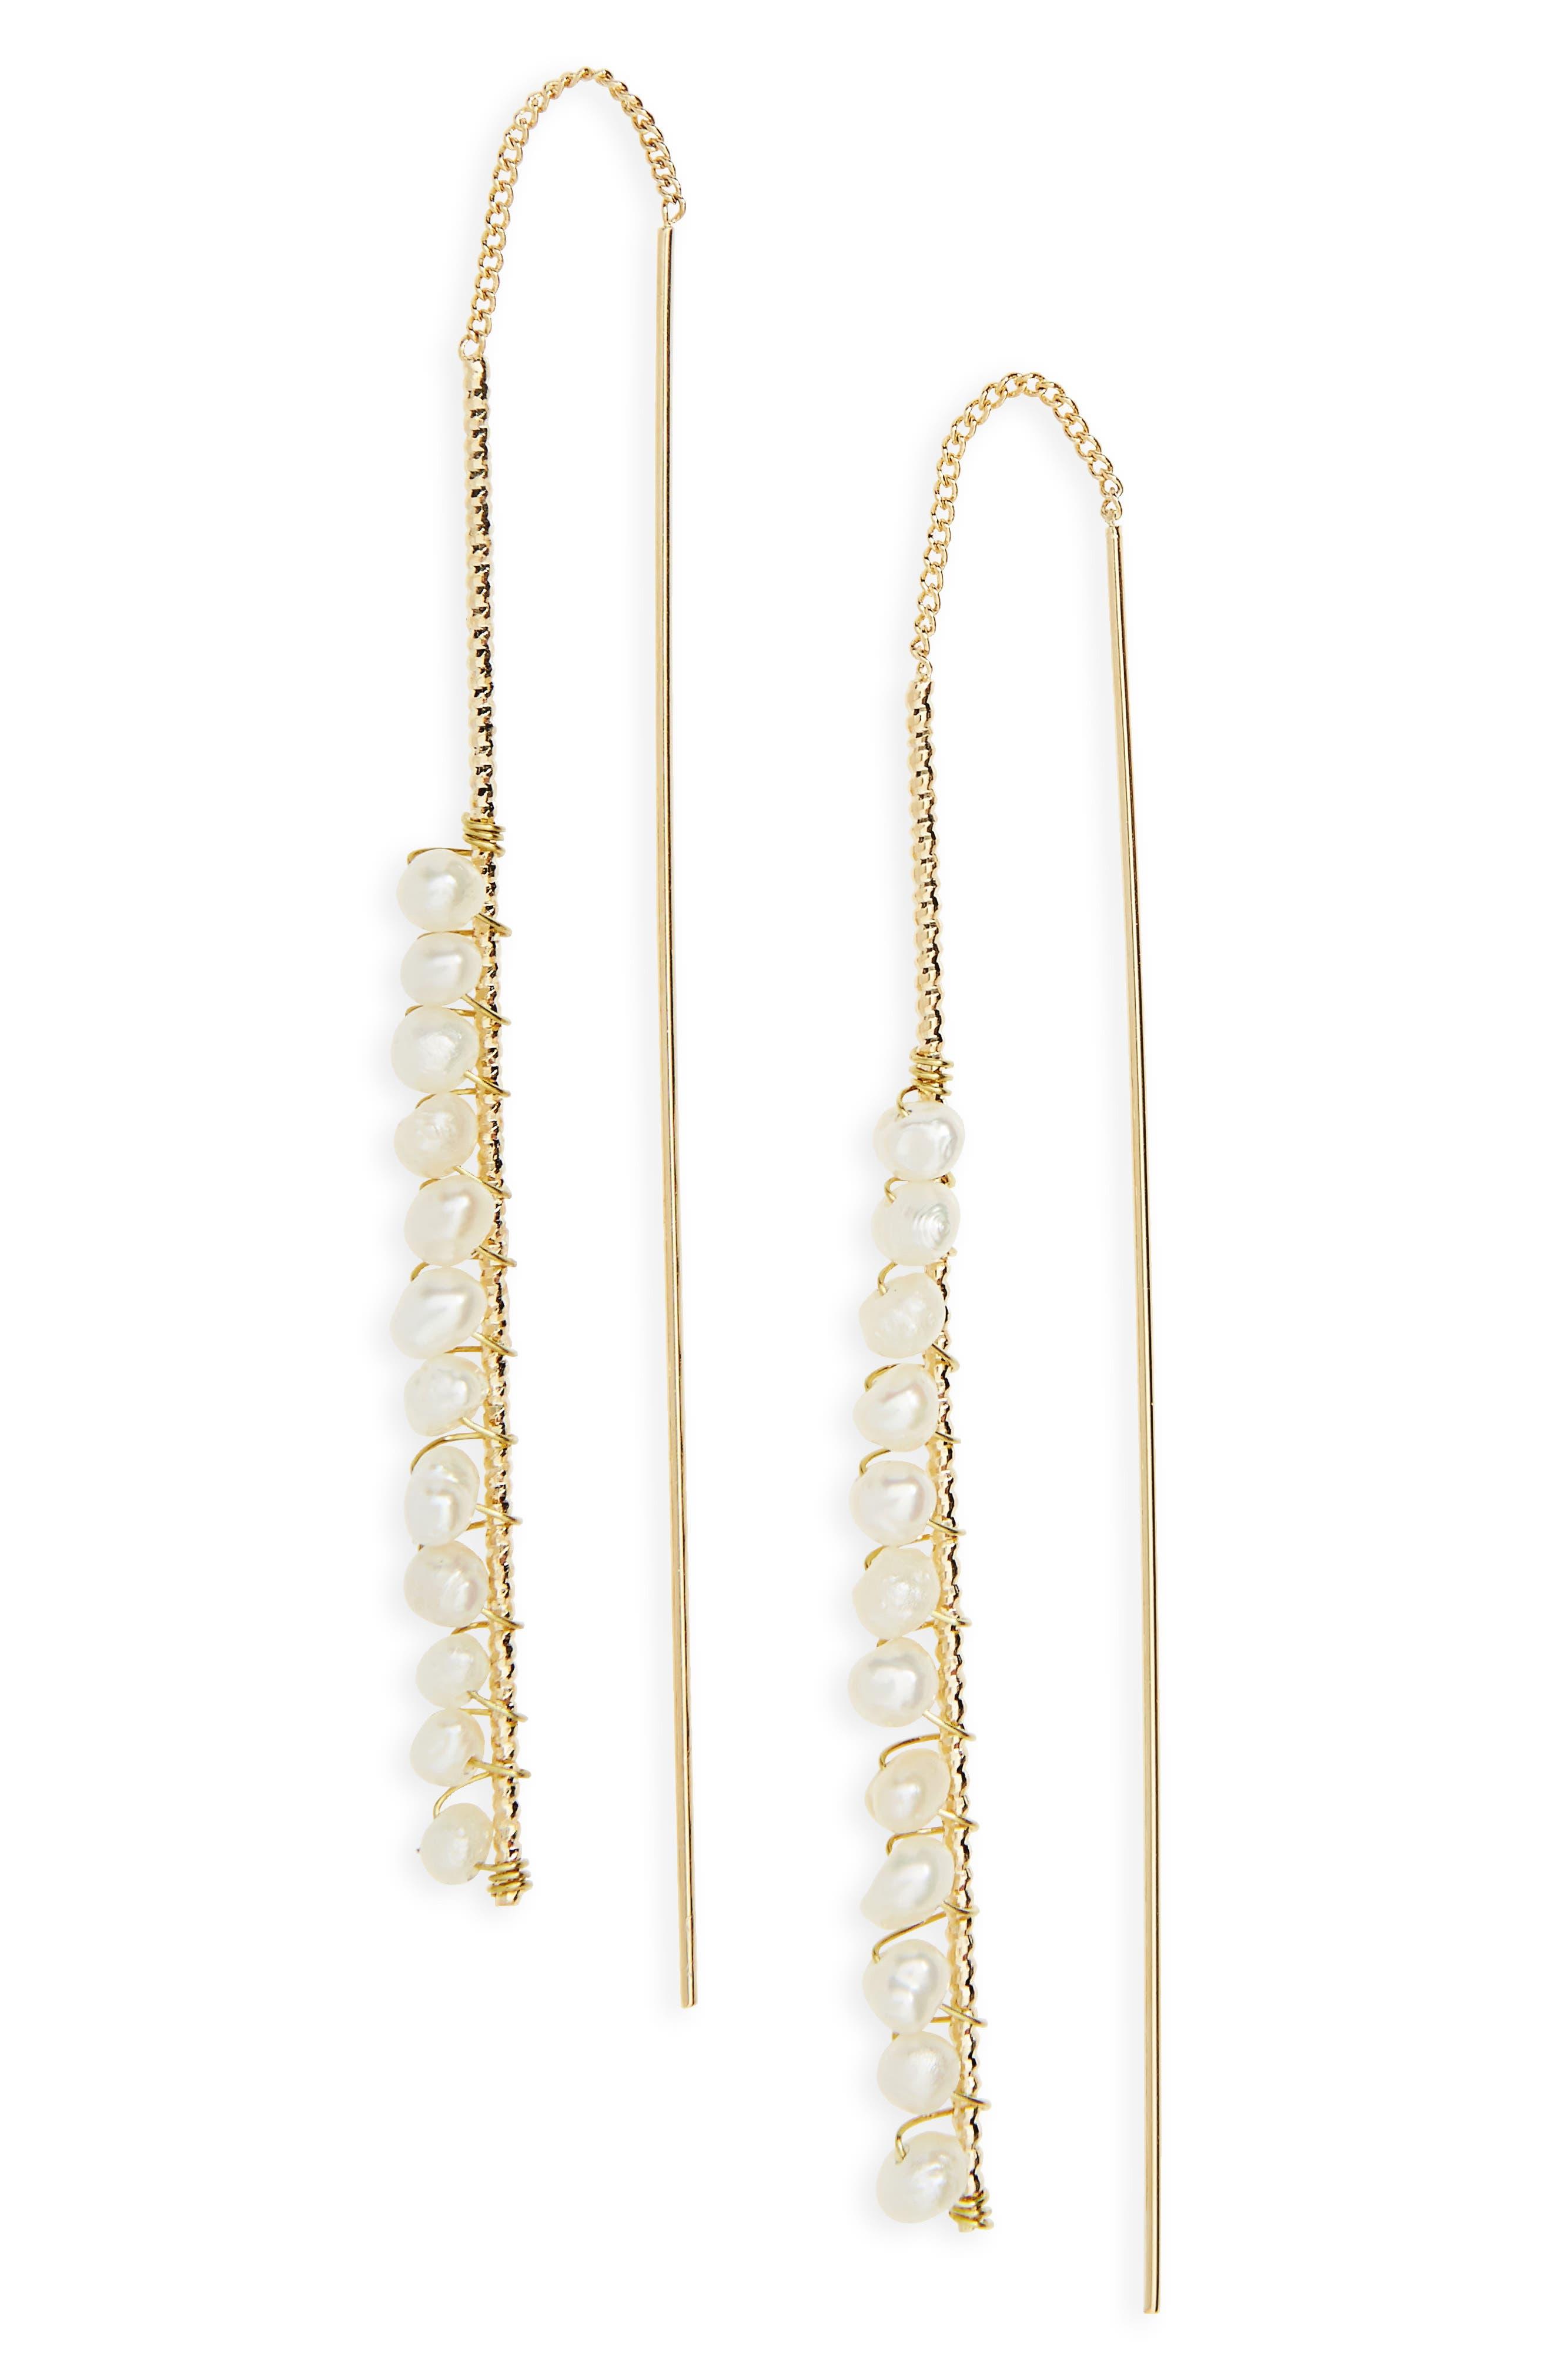 Freshwater Pearl Linear Threader Earrings,                             Main thumbnail 1, color,                             White